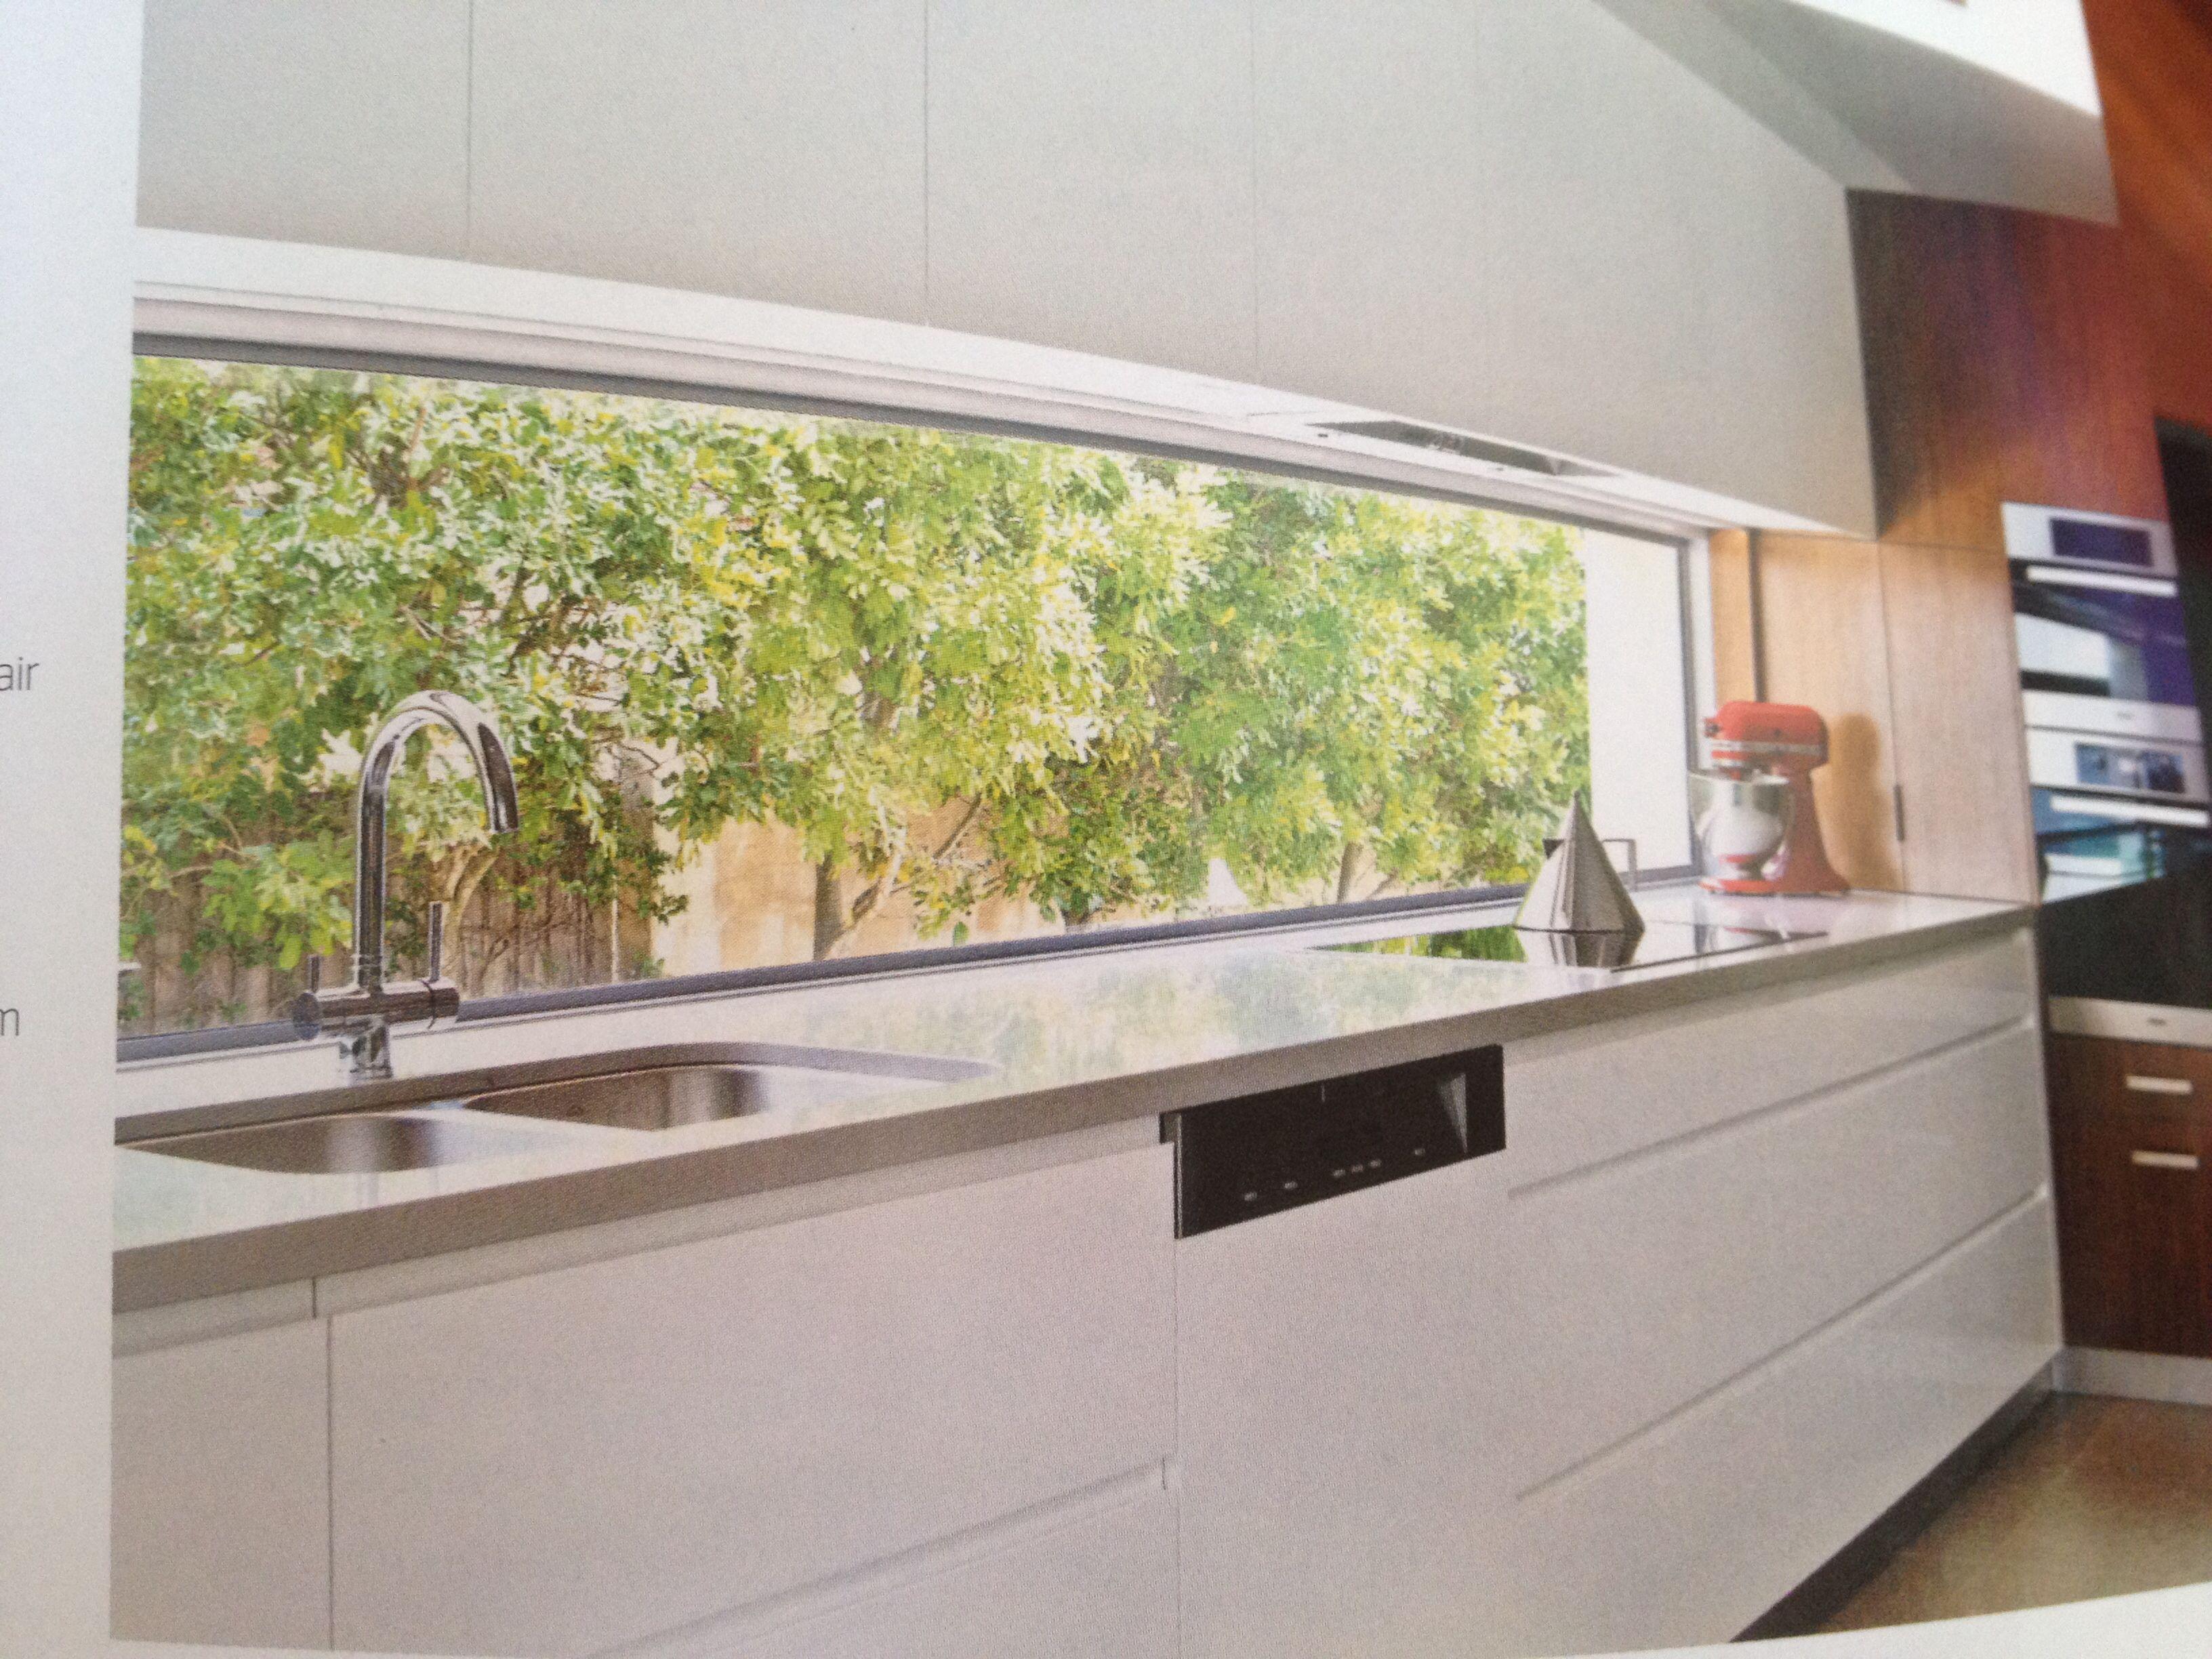 Kitchen window from outside  greenery outside the kitchen splash back window absolutely love